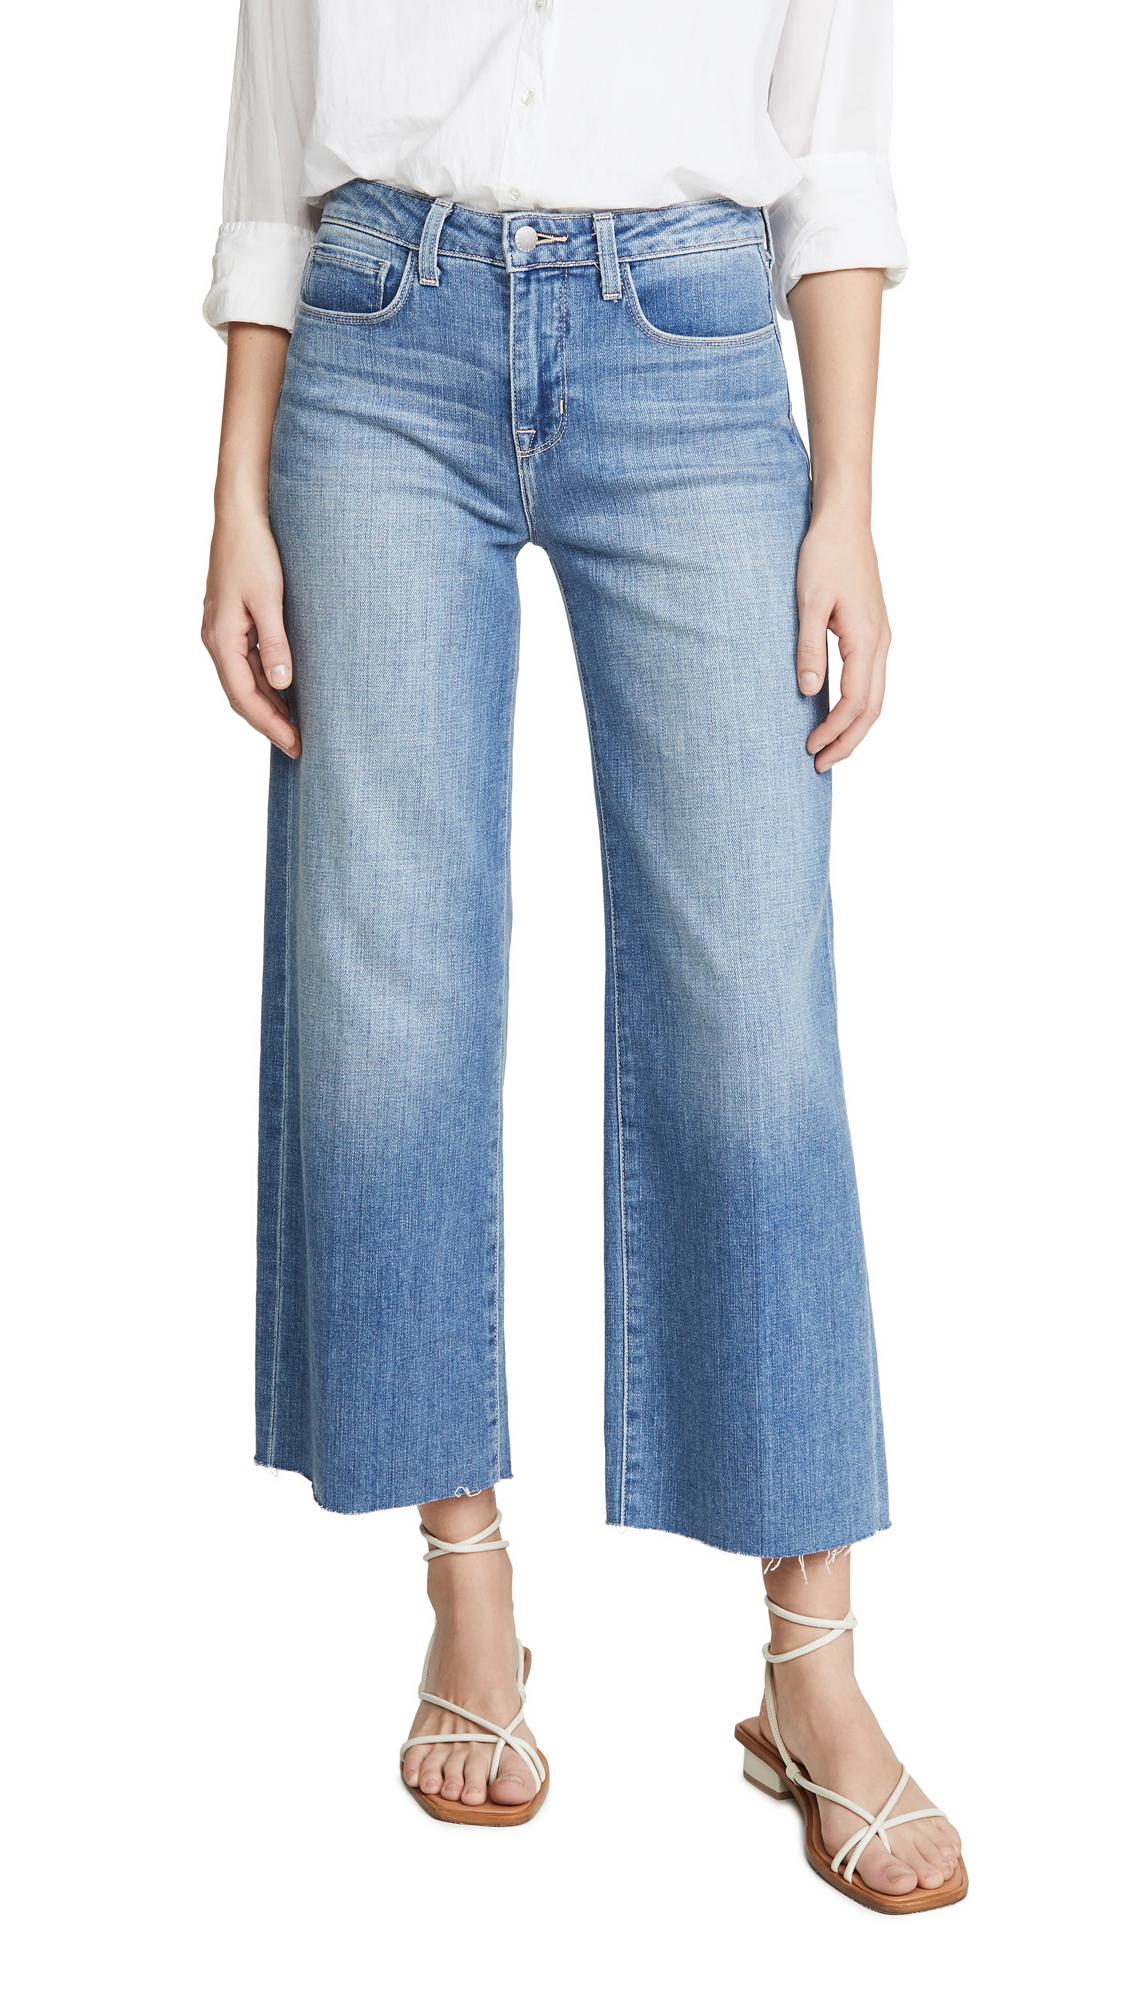 L'AGENCE Danica High Rise Wide Leg Jeans